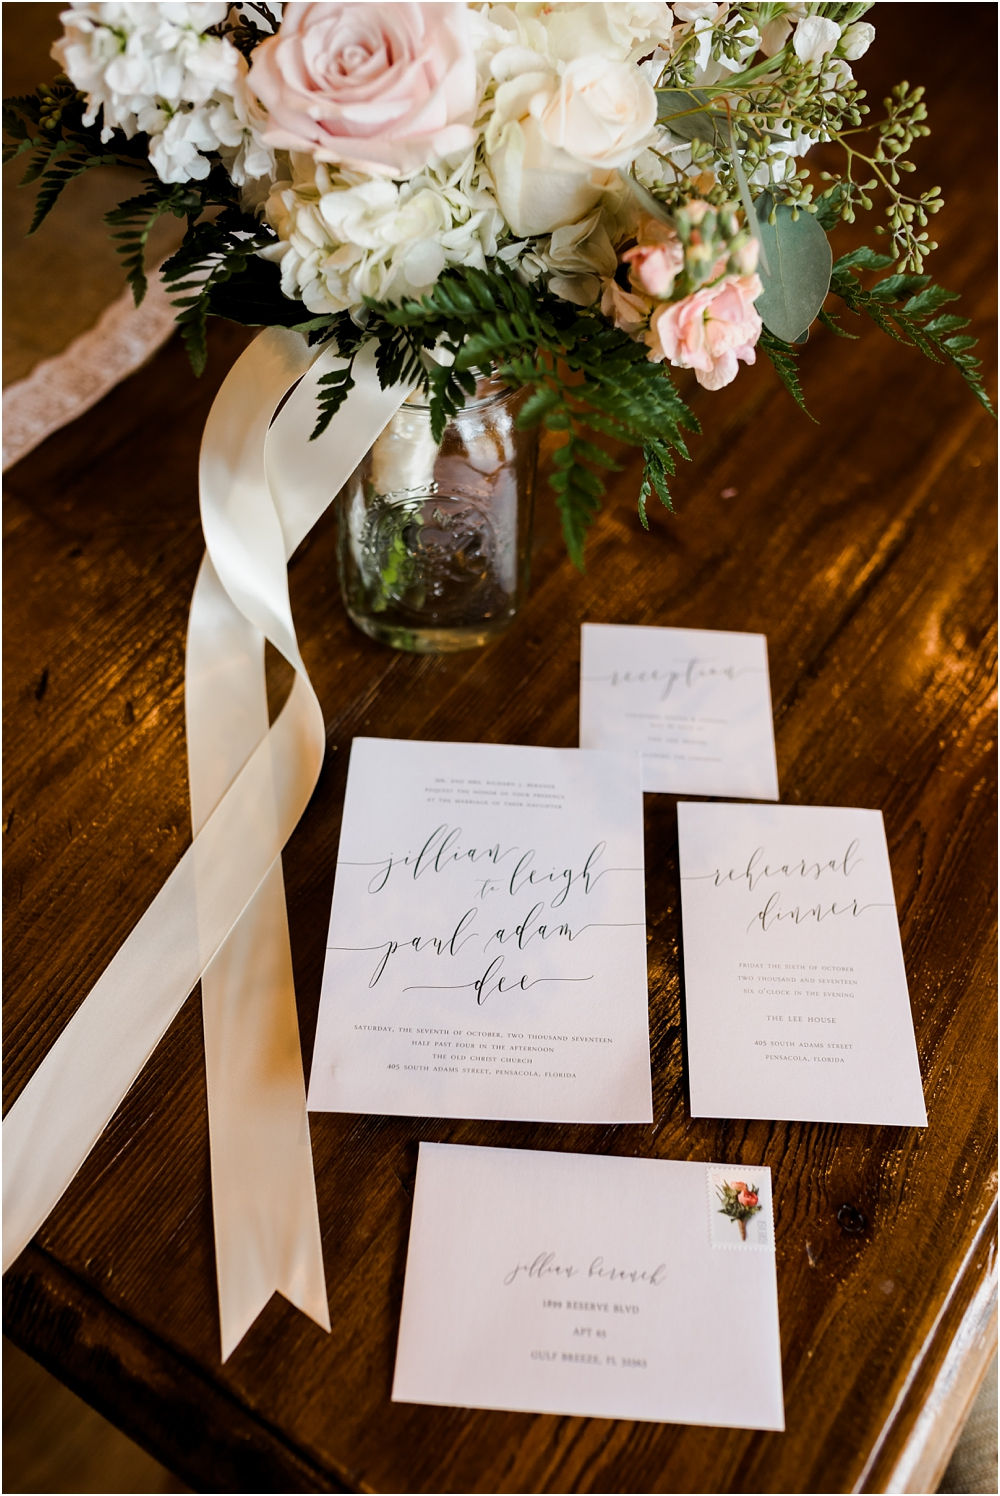 pensacola-wedding-photographer-kiersten-grant-6.jpg